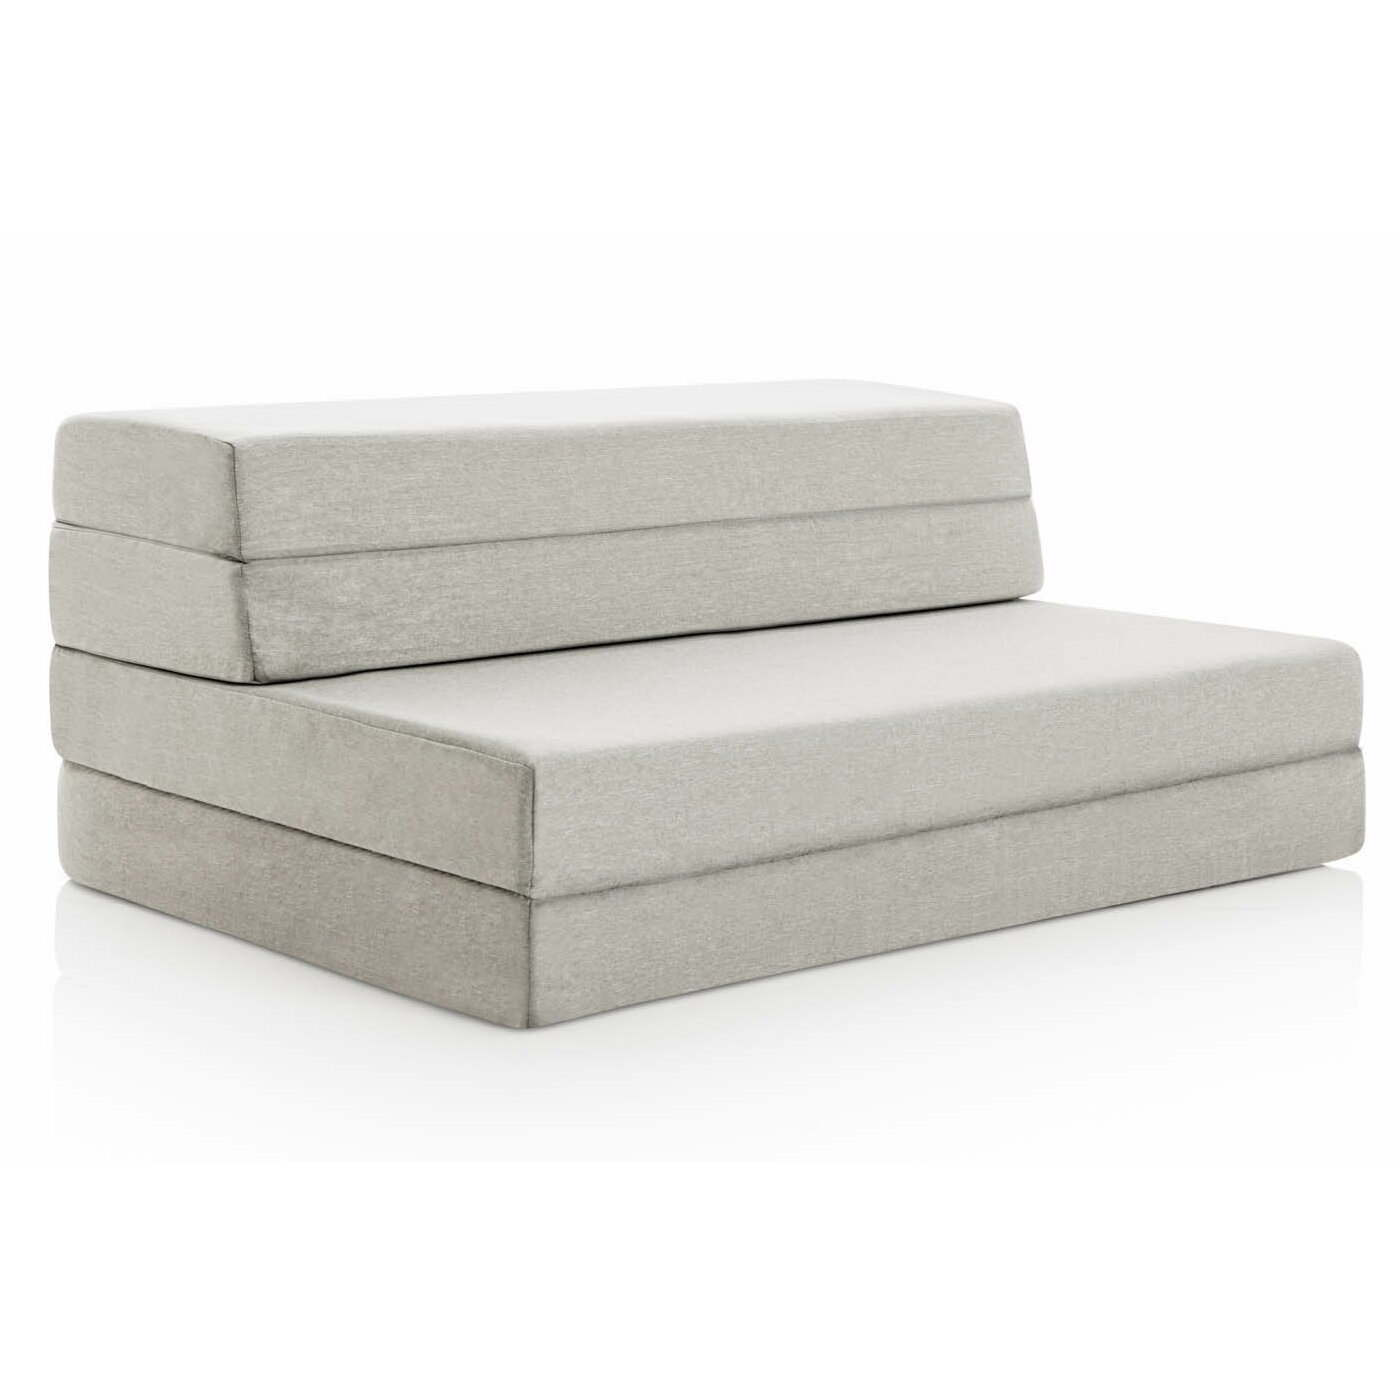 lucid 4 medium firm gel memory foam mattress reviews. Black Bedroom Furniture Sets. Home Design Ideas